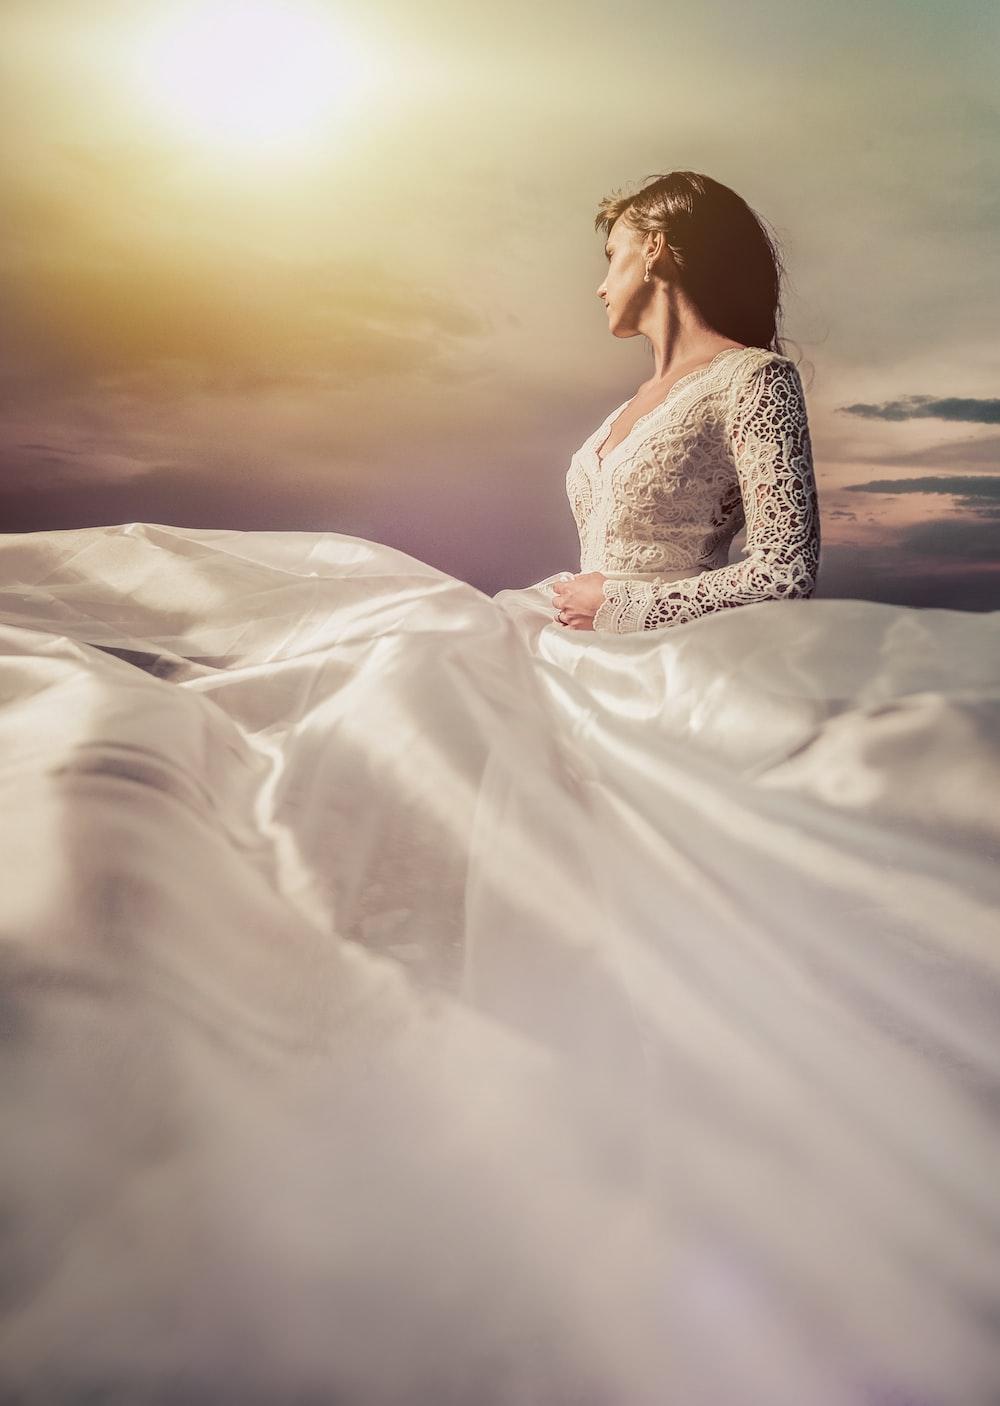 wedding dress and sky